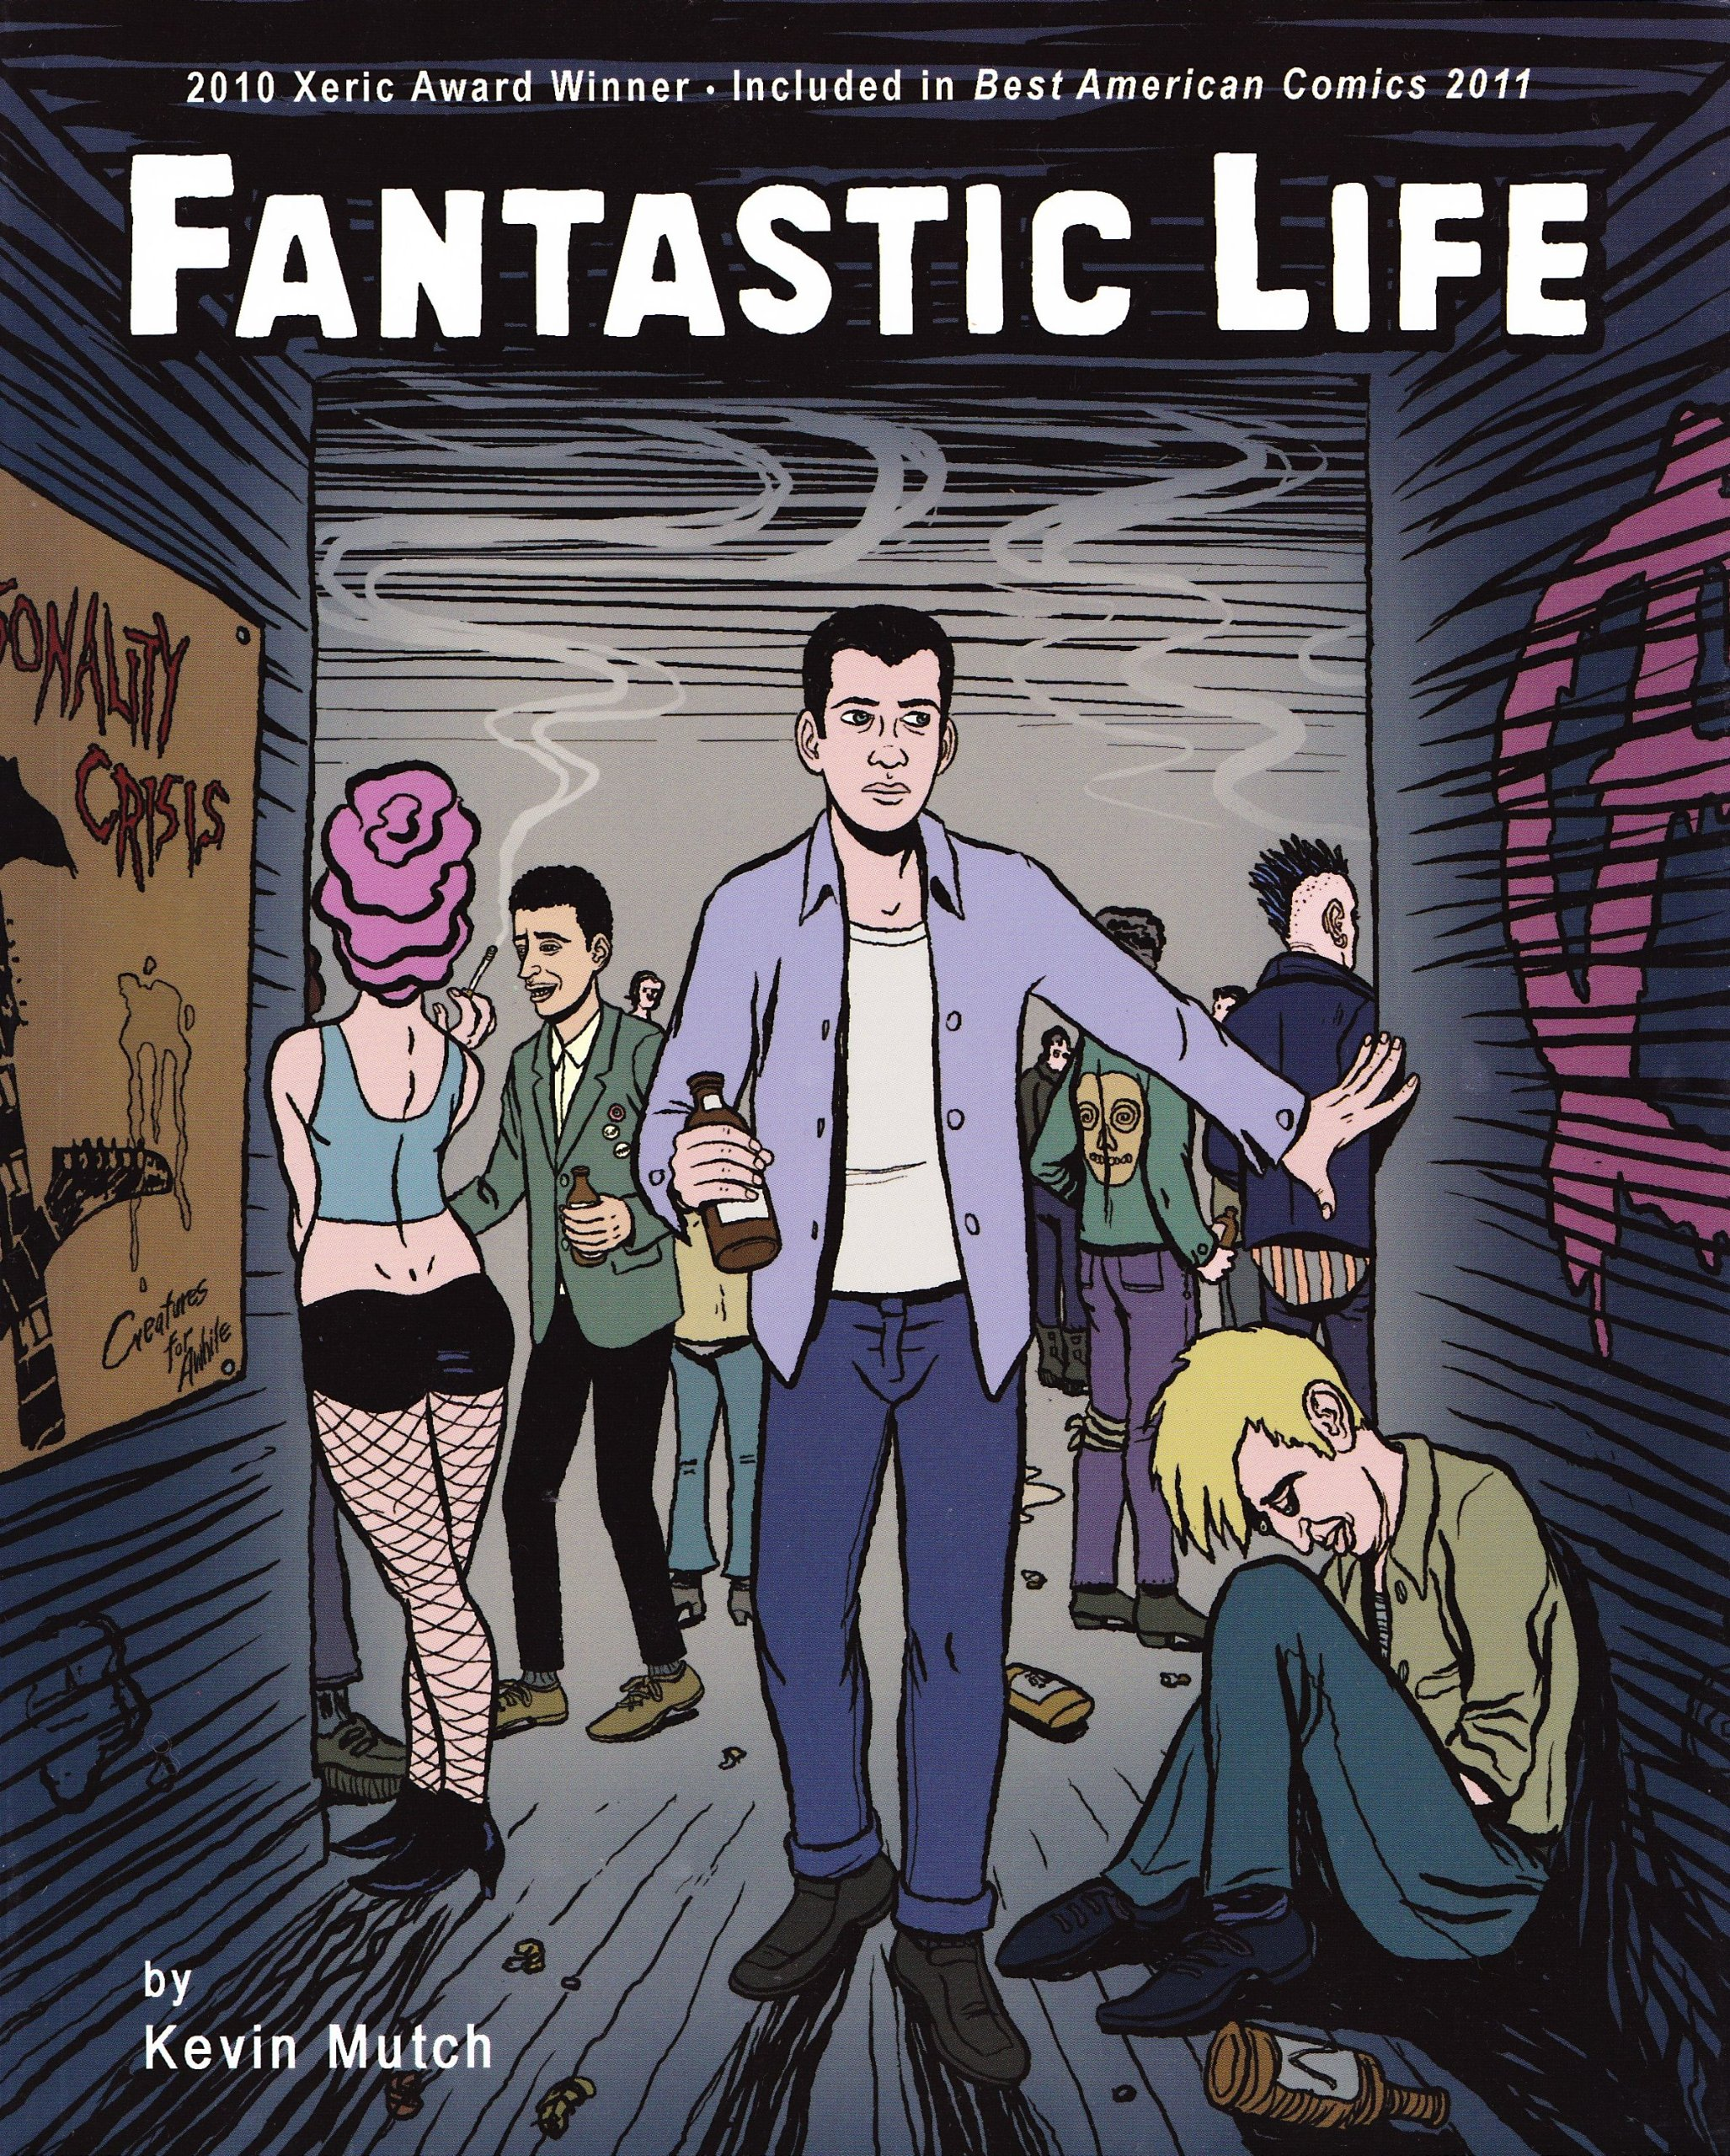 Fantastic Life, Kevin Mutch